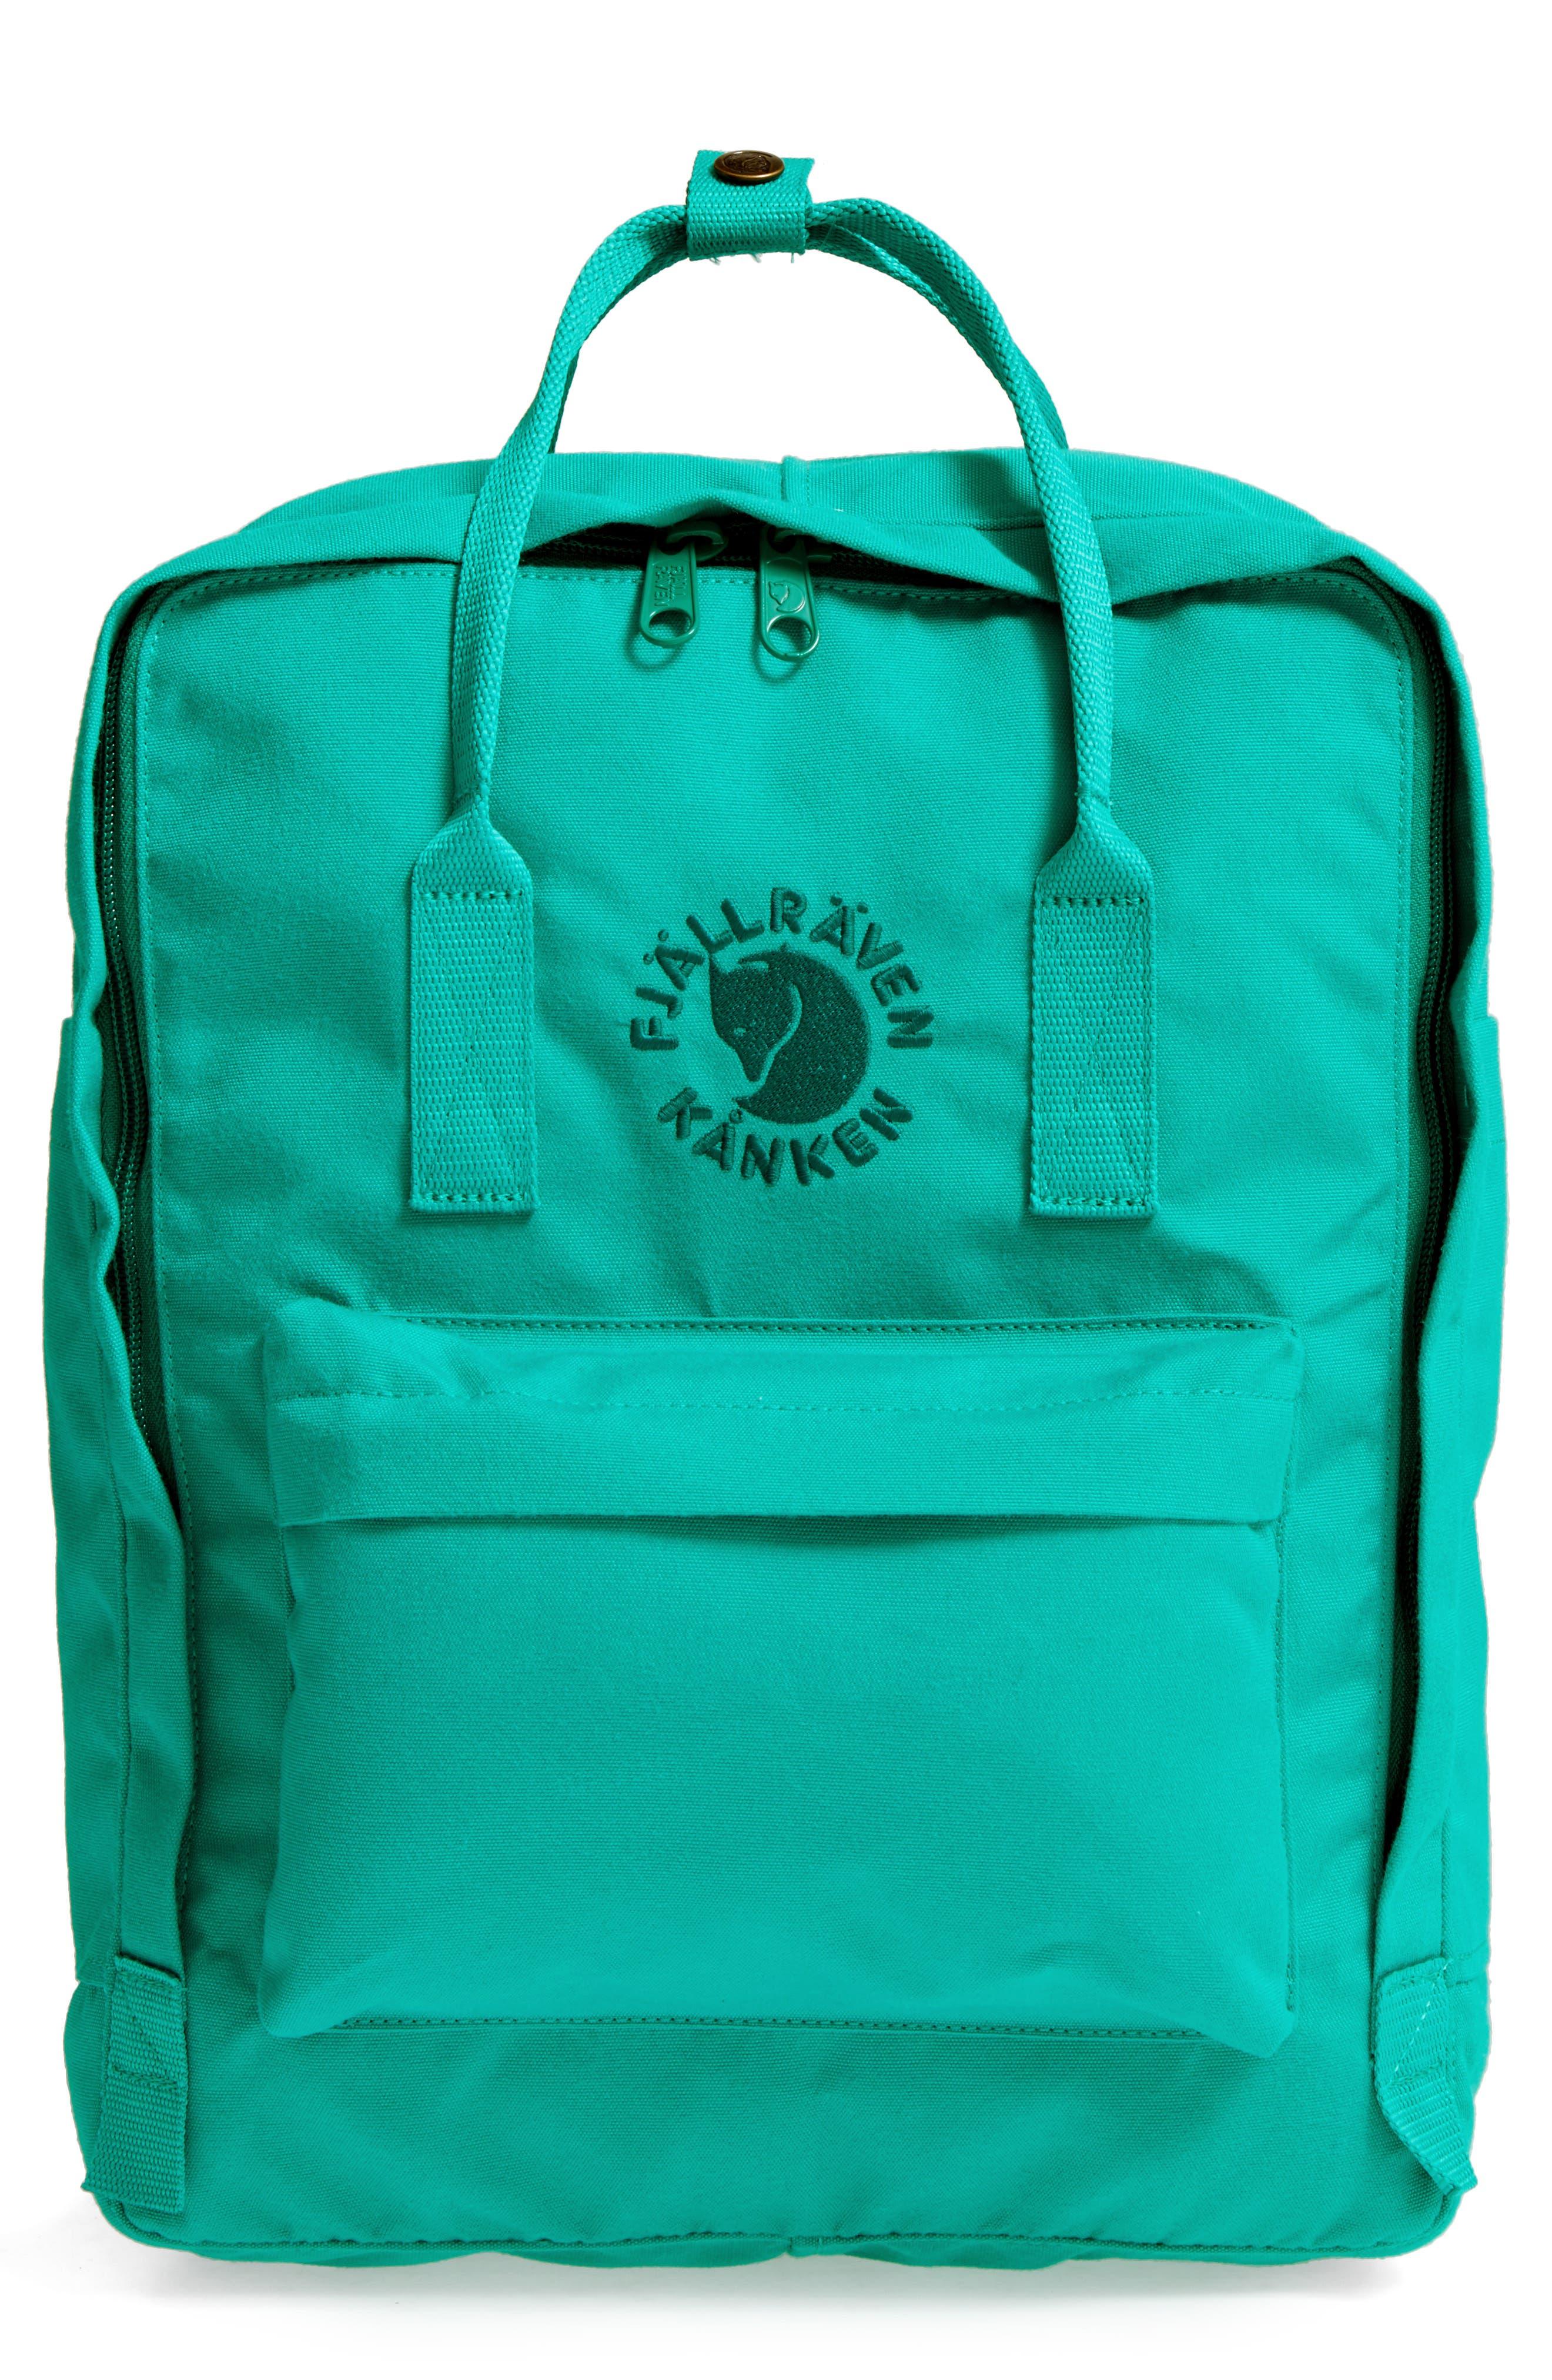 Alternate Image 1 Selected - Fjällräven Re-Kånken Water Resistant Backpack